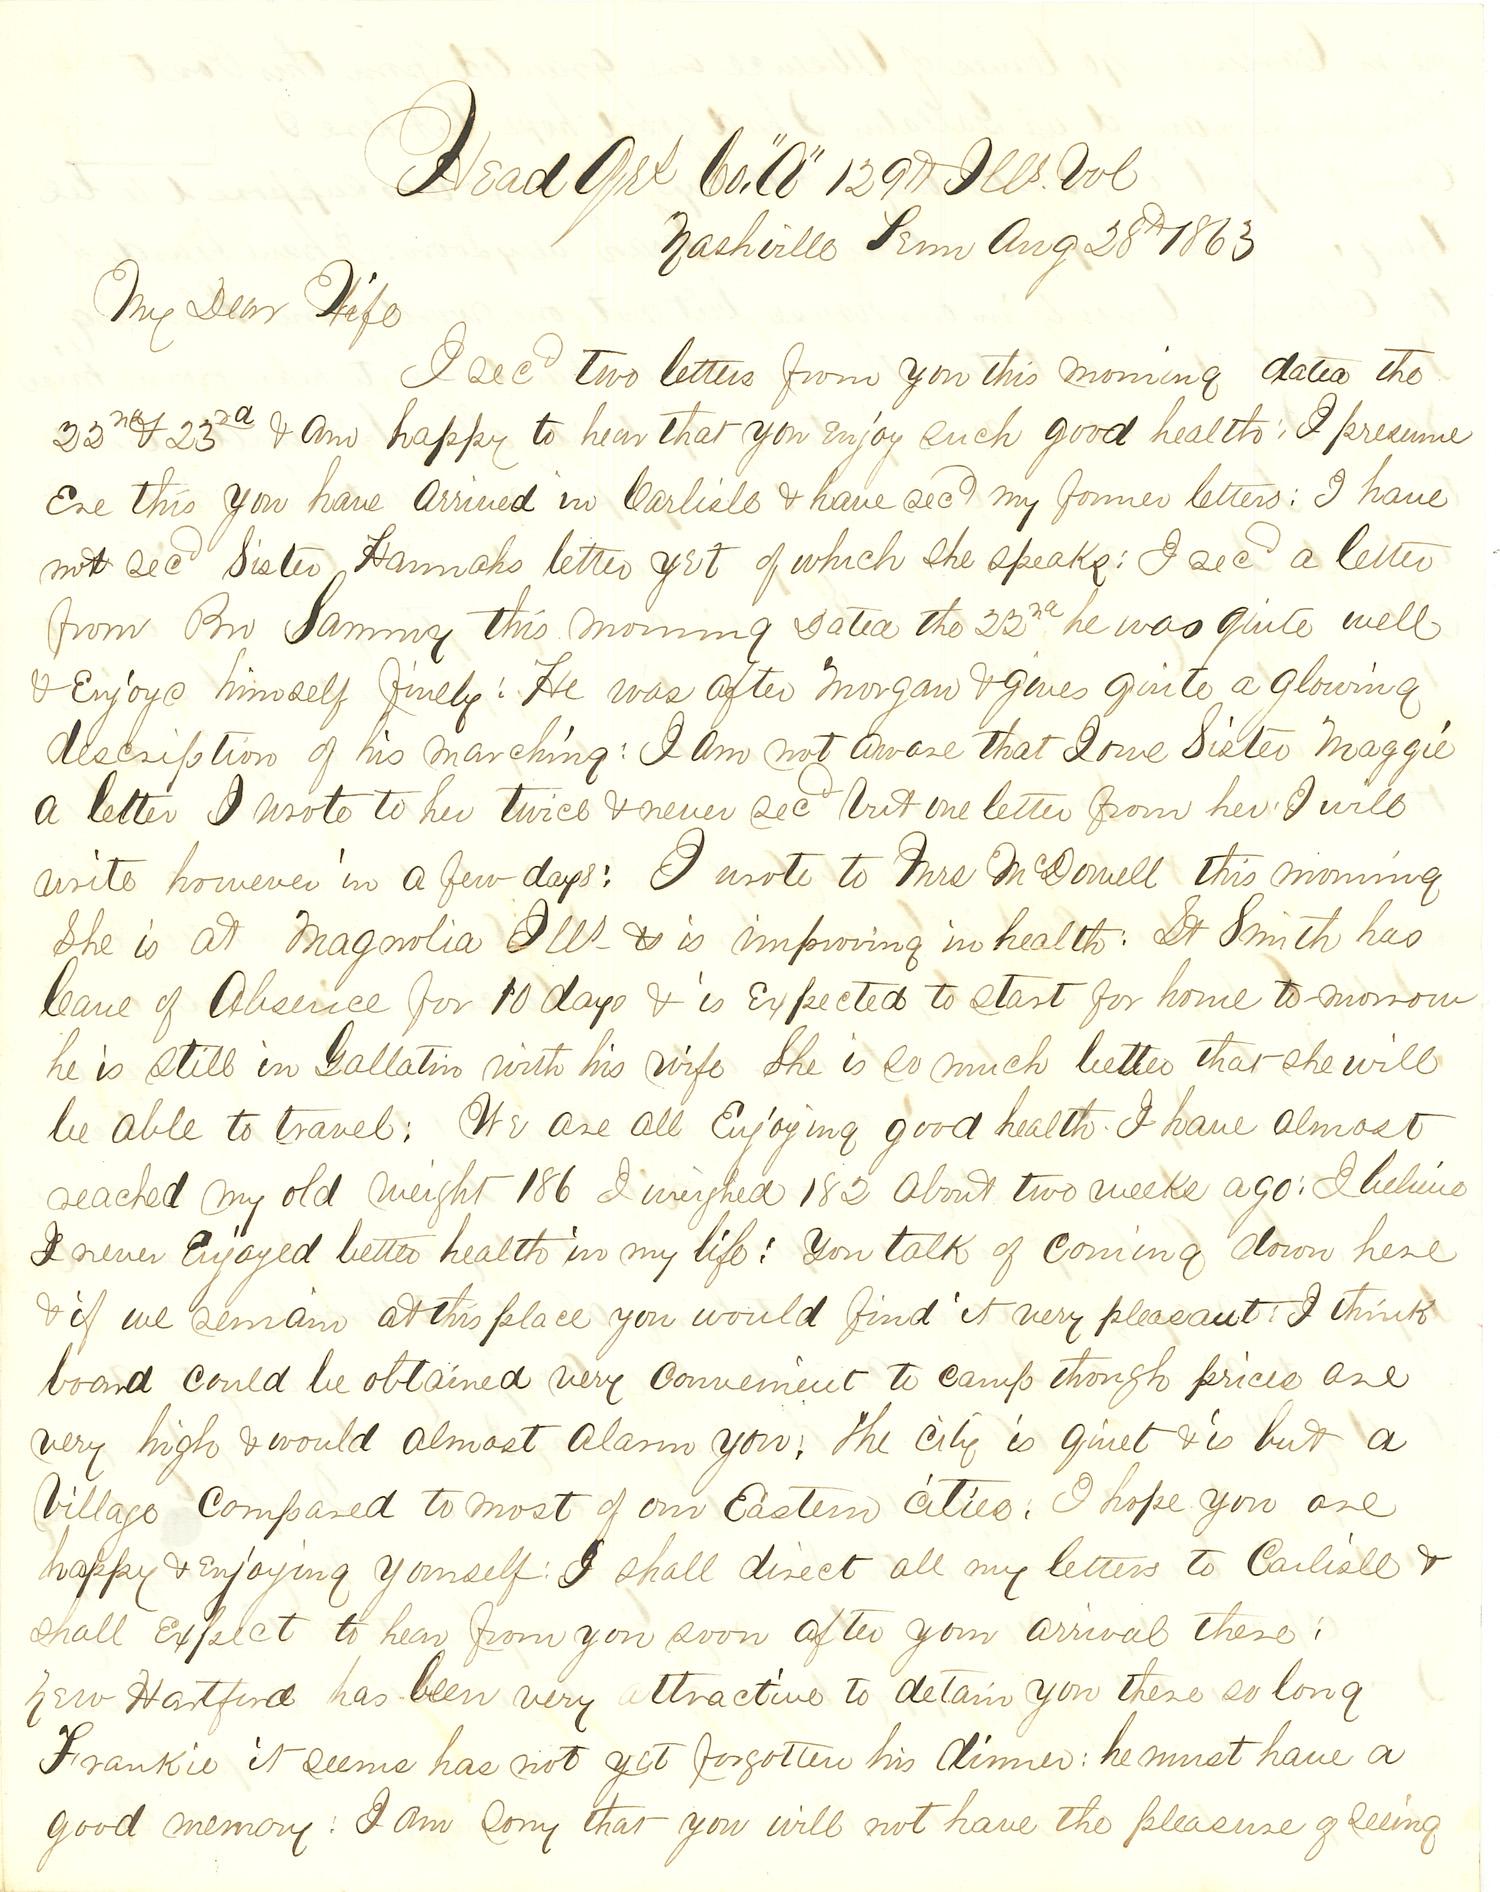 Joseph Culver Letter, August 28, 1863, Letter 2, Page 1